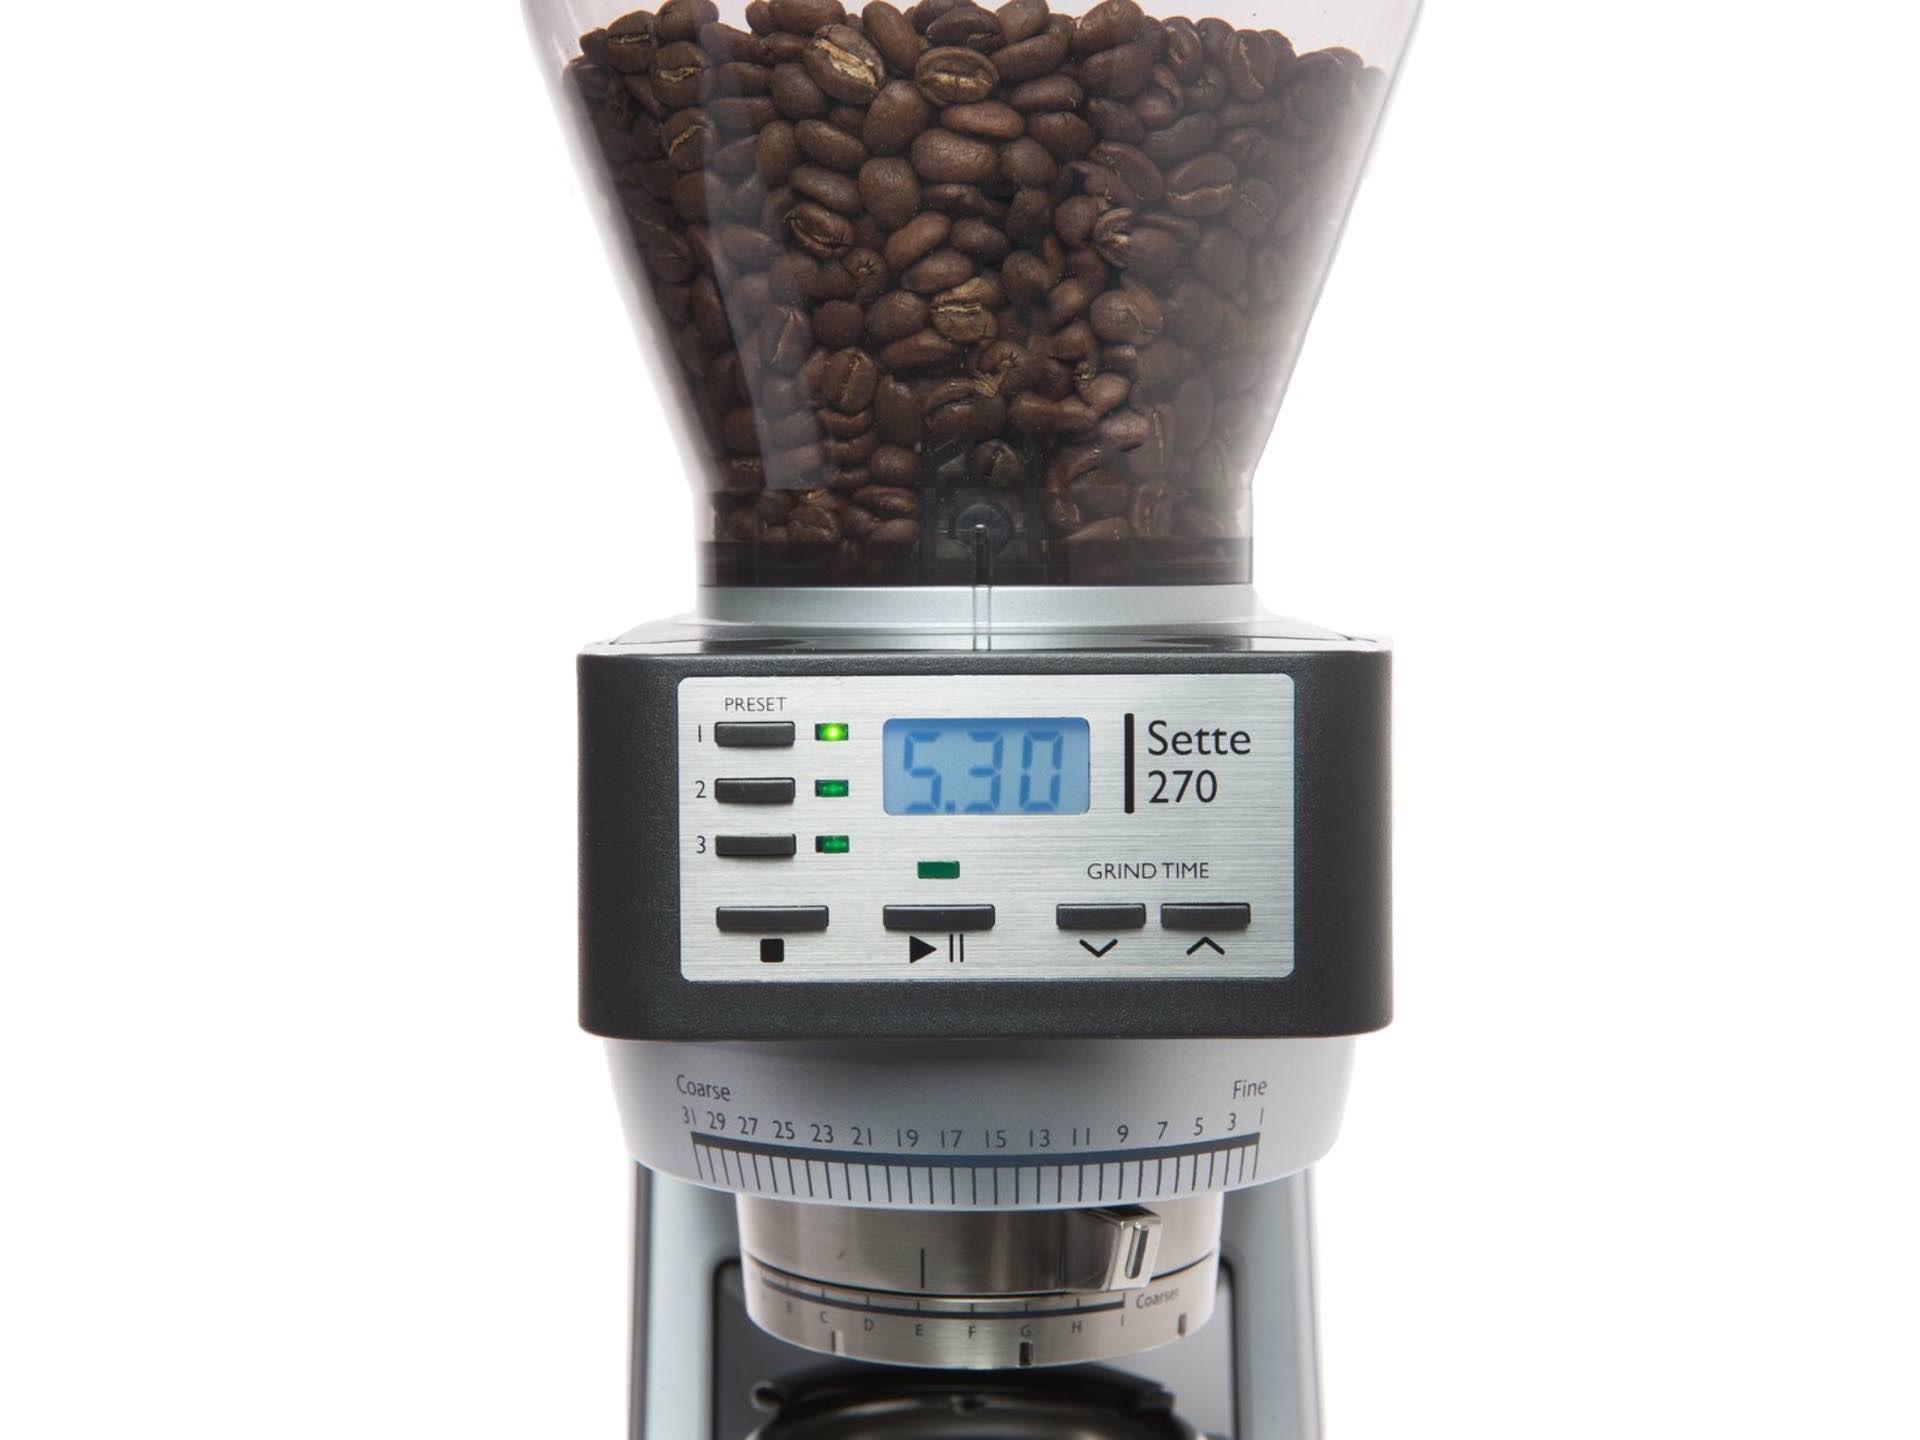 baratza-sette-270-espresso-grinder-front-control-panel